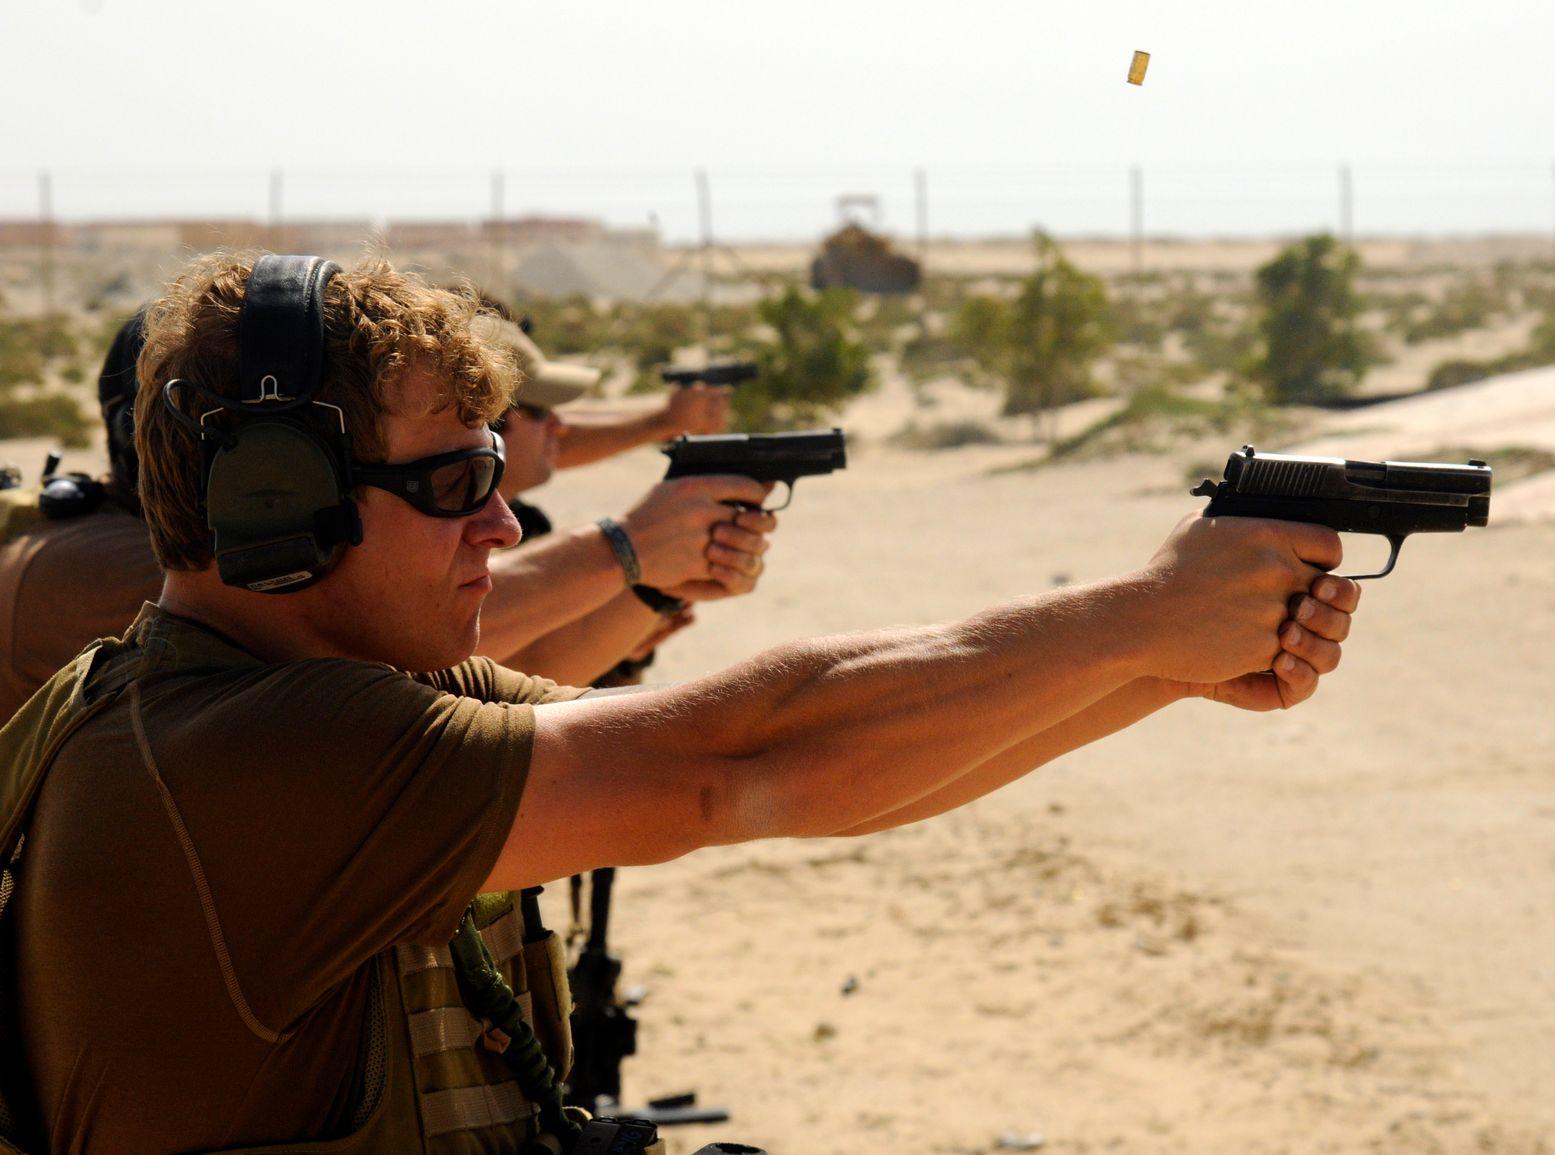 The P226 Handgun Is the Navy Seal's Favorite Gun for 1 Reason